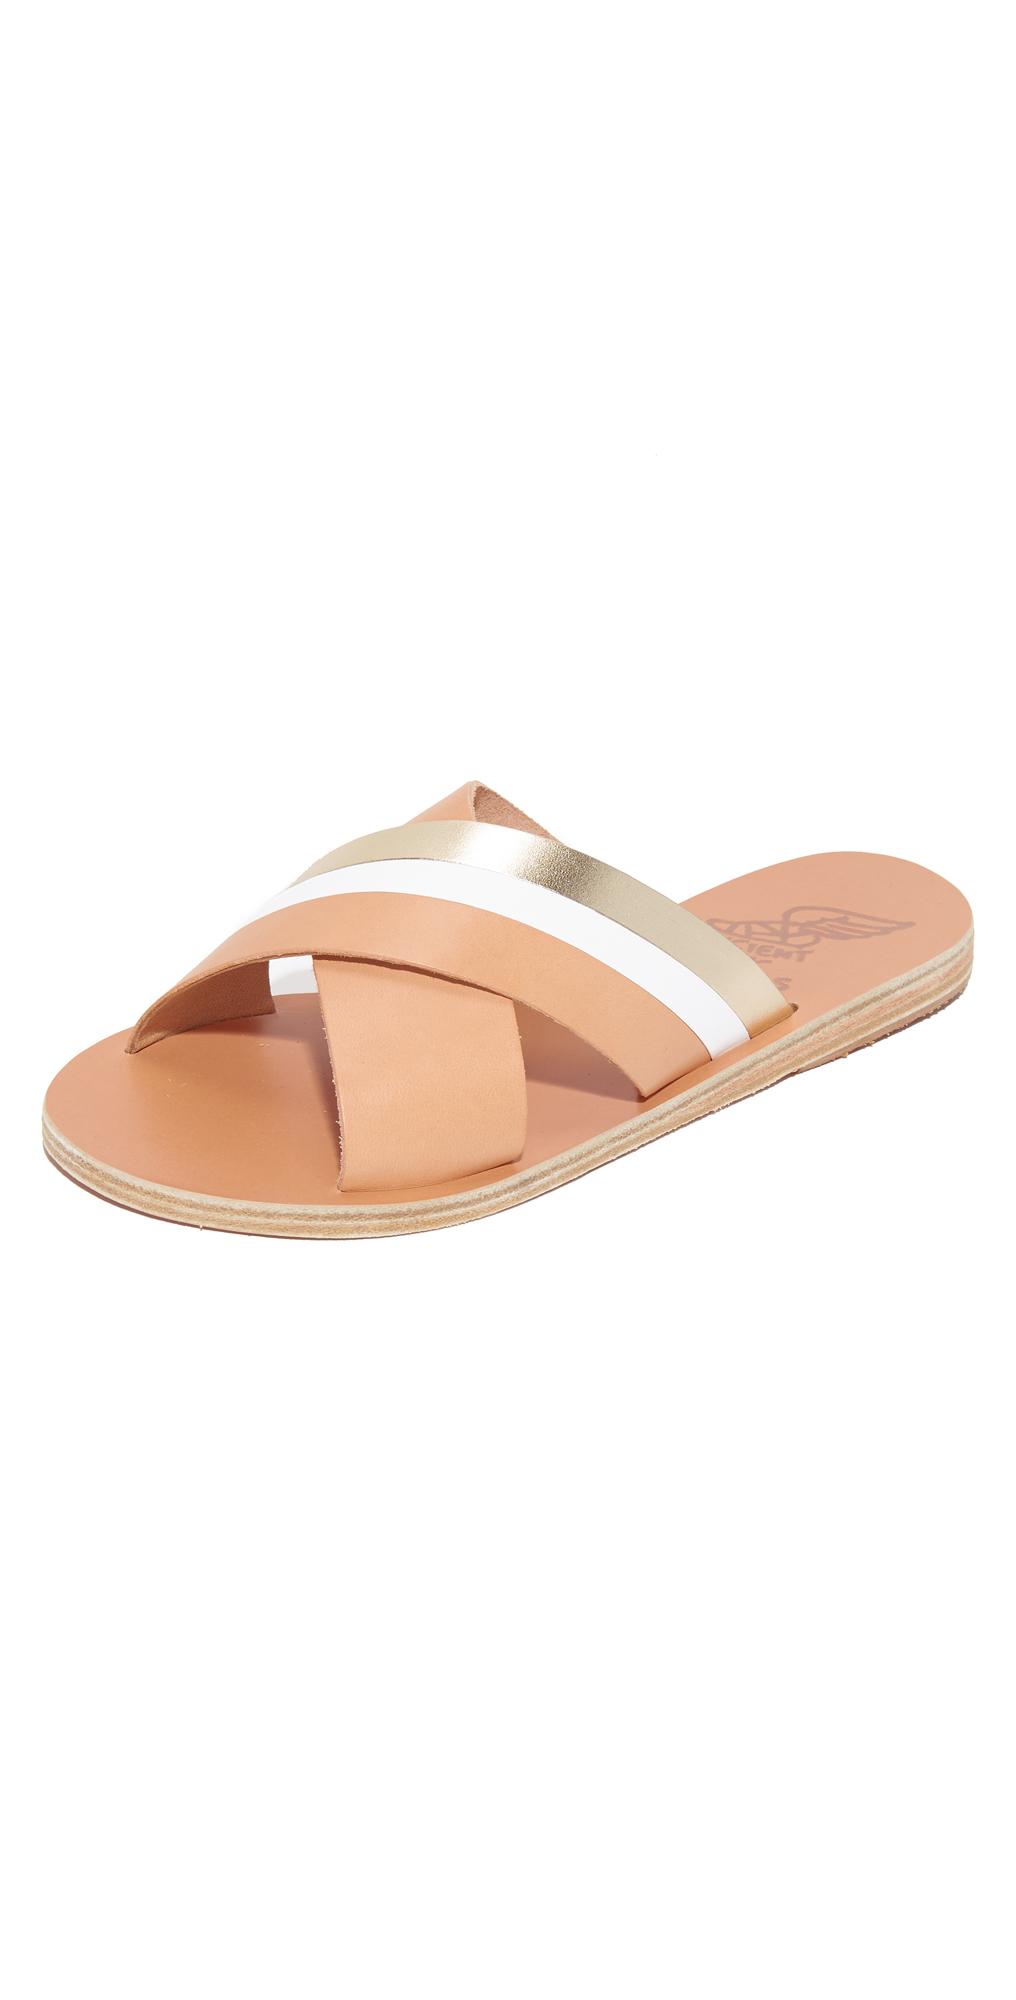 Thais Crisscross Slides Ancient Greek Sandals